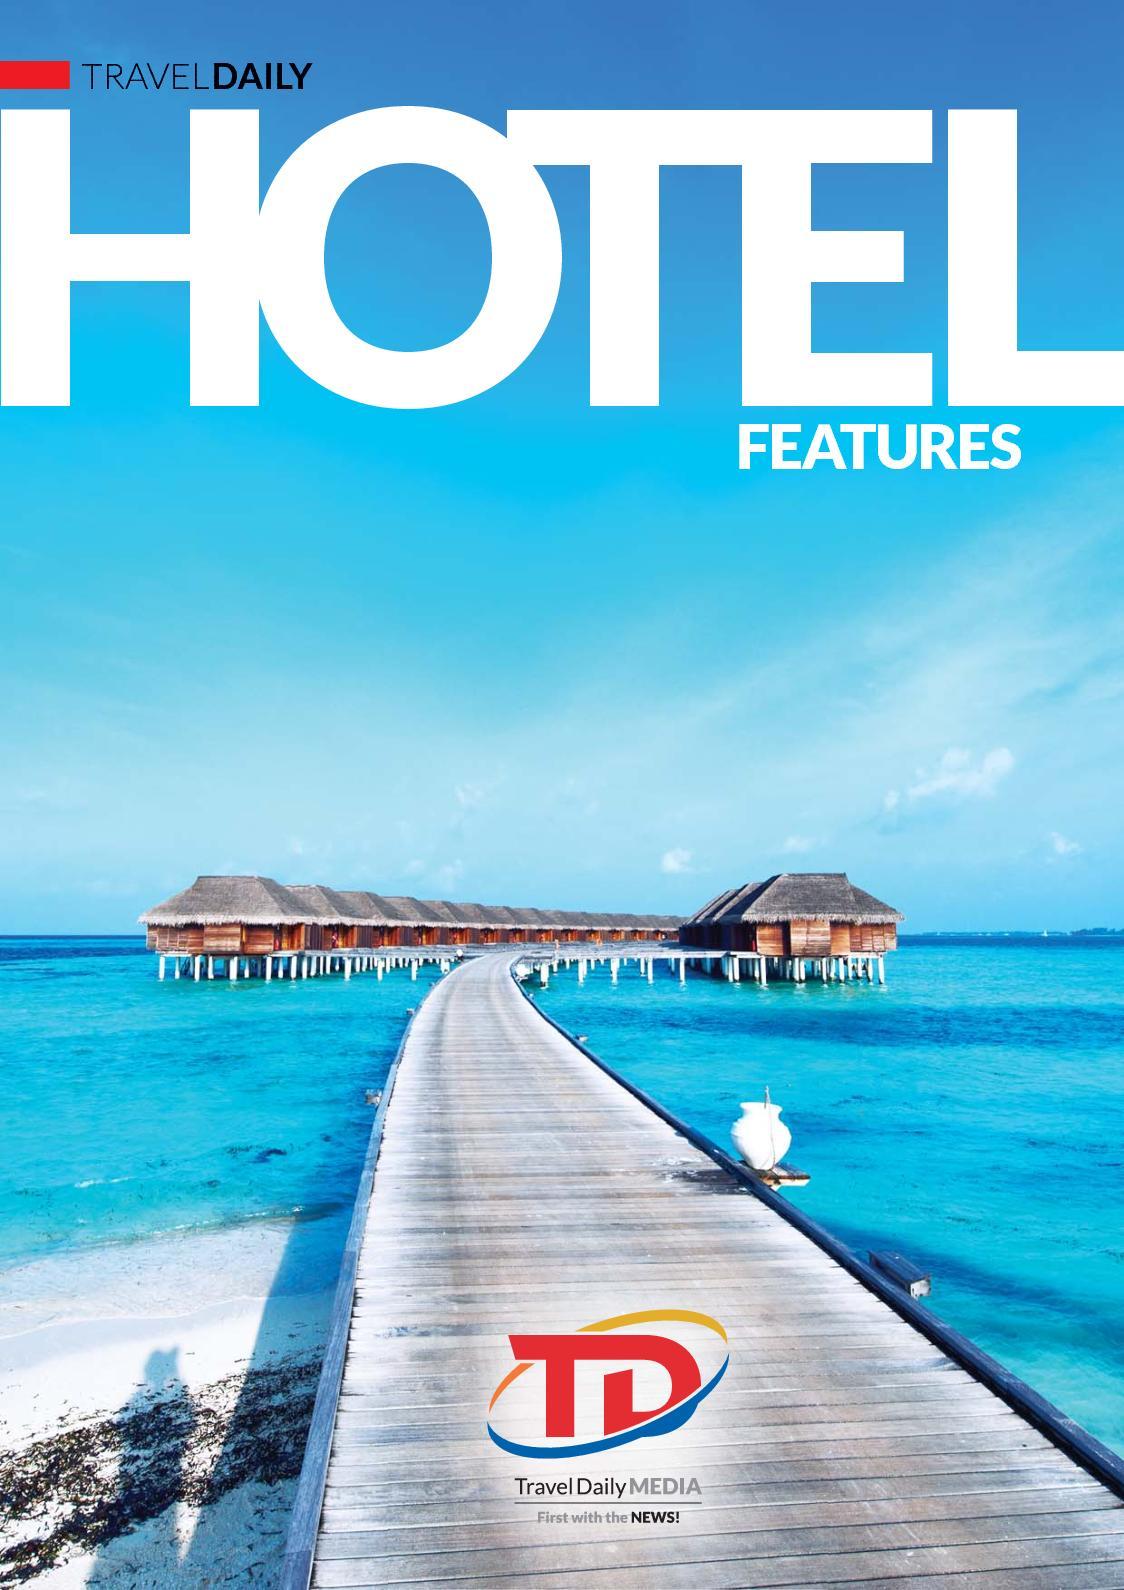 Collectables Hotel Luxury Pens Mandarin Oriental Singapore Hyatt Shangri La Four Seasons 207 Latest Technology